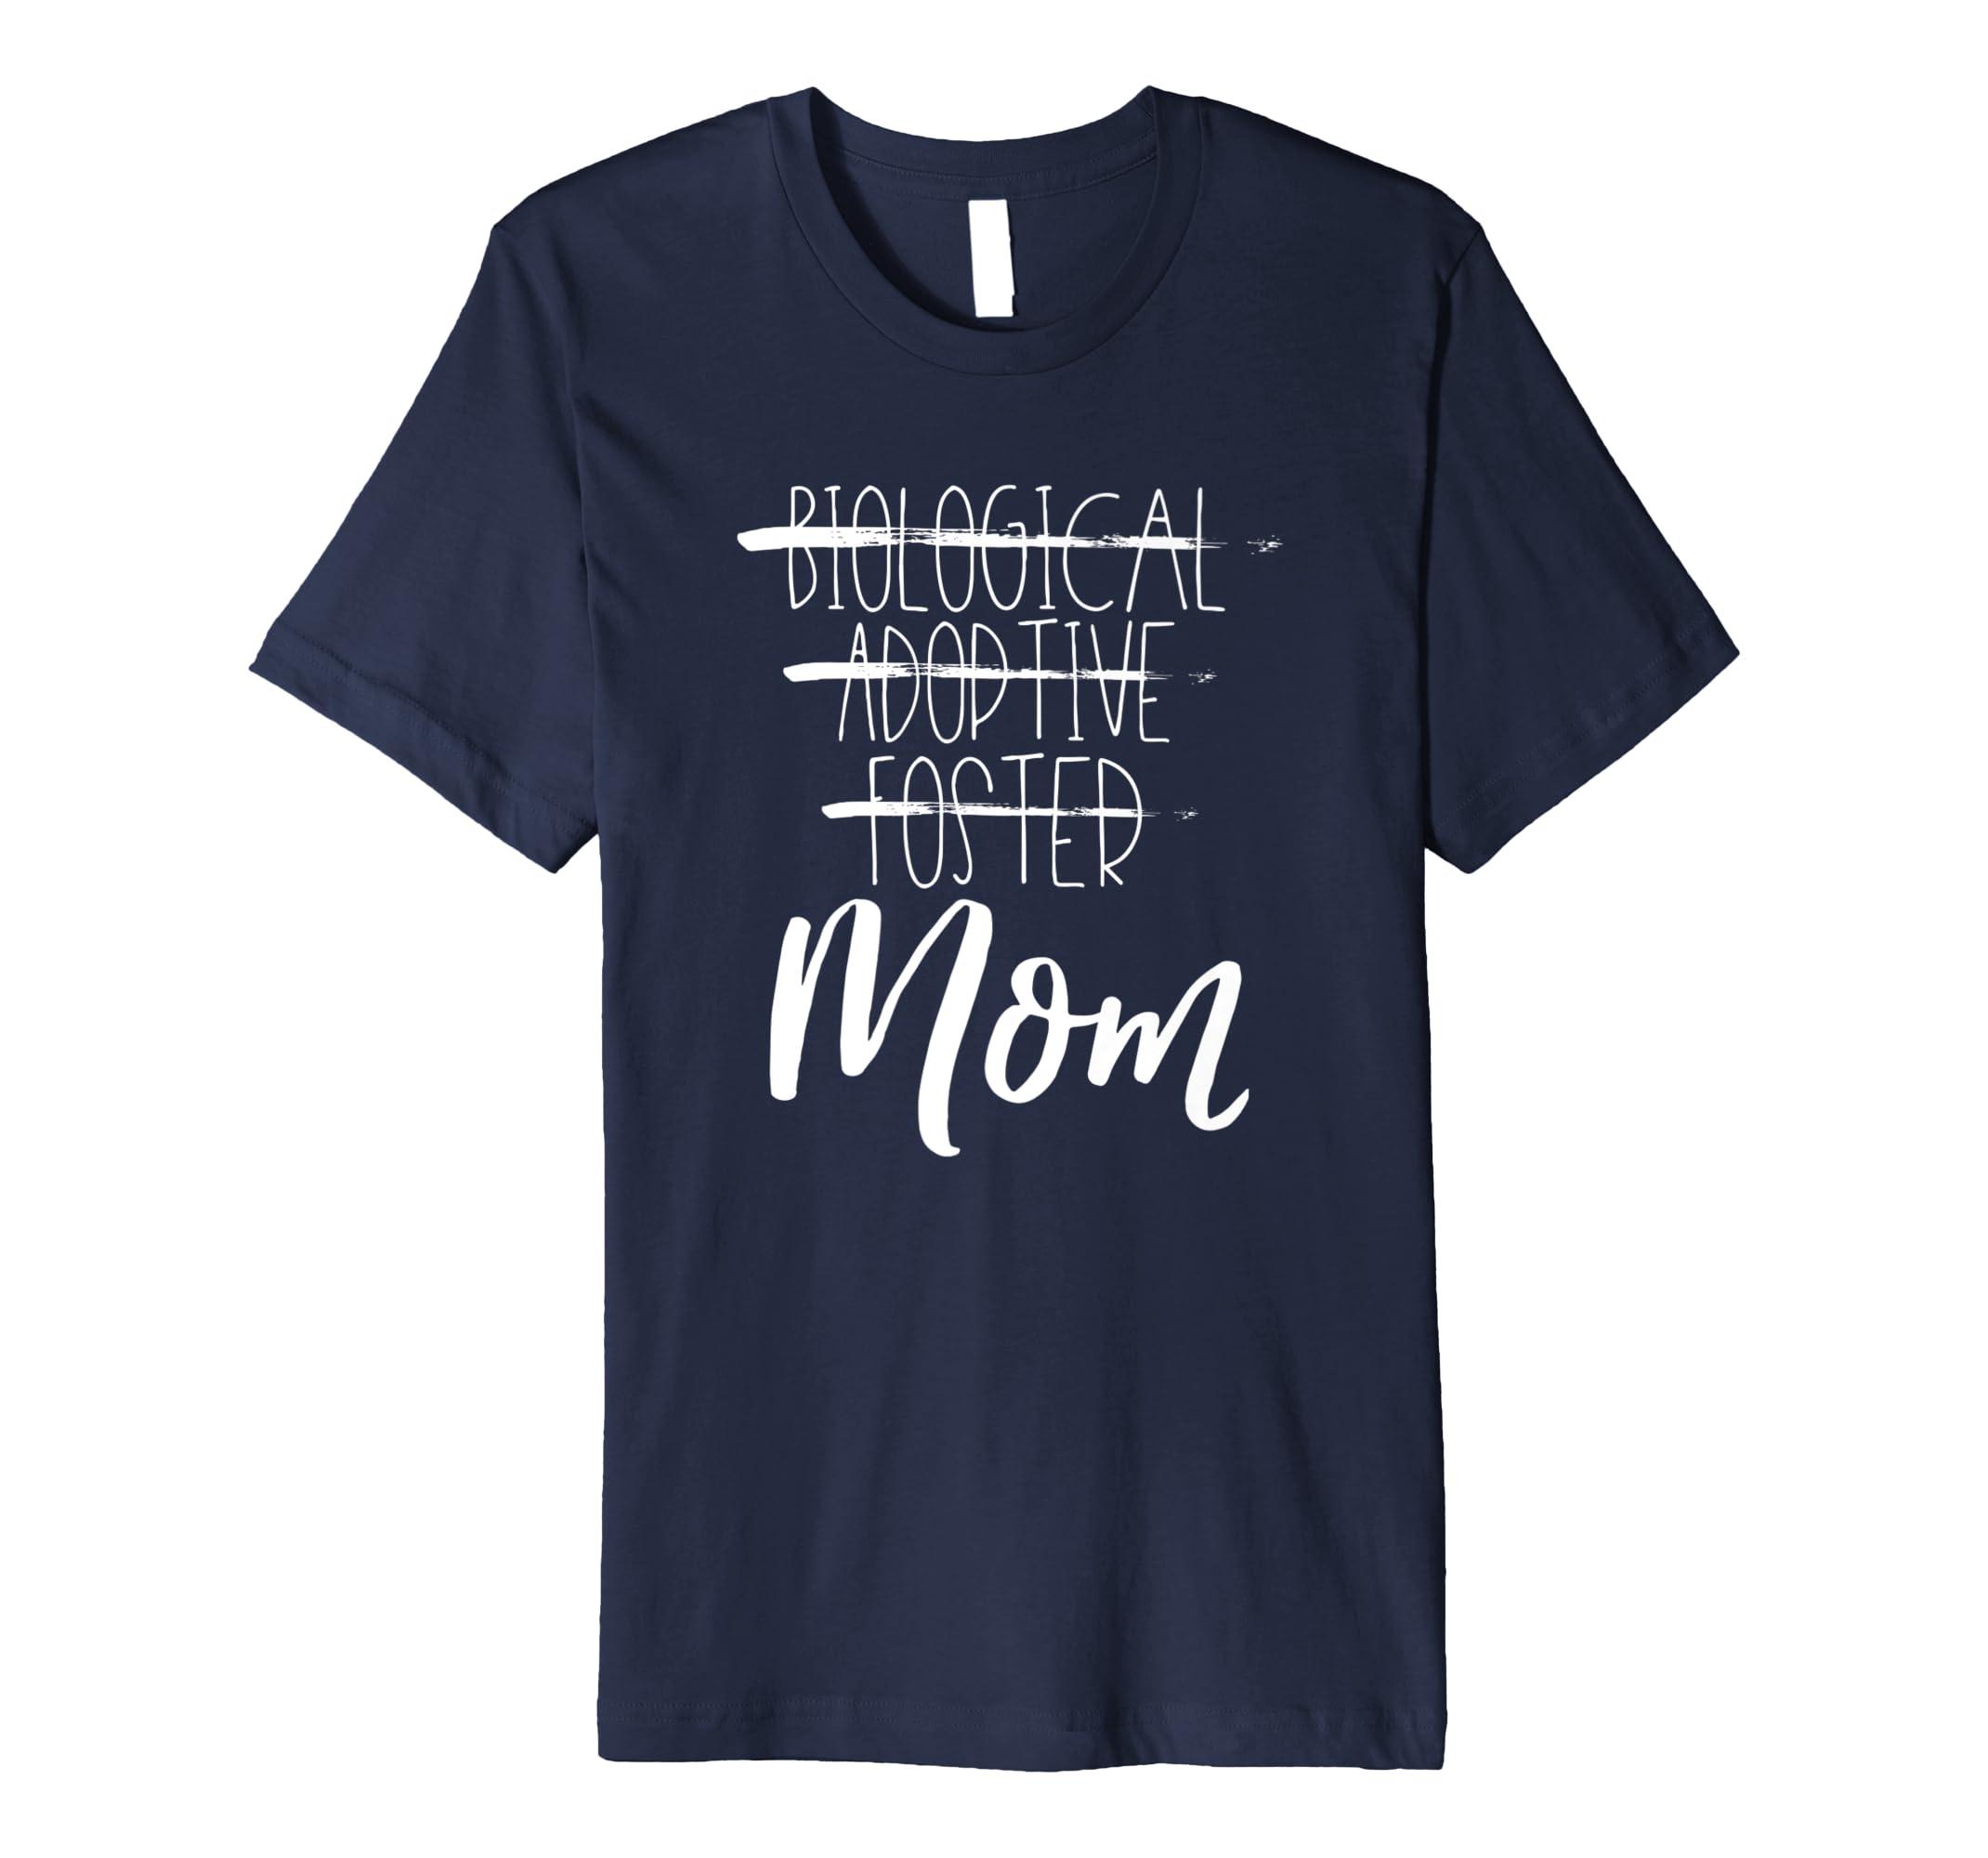 Not Biological Adoptive Foster Just Mom Shirt Adoption Love-Teechatpro